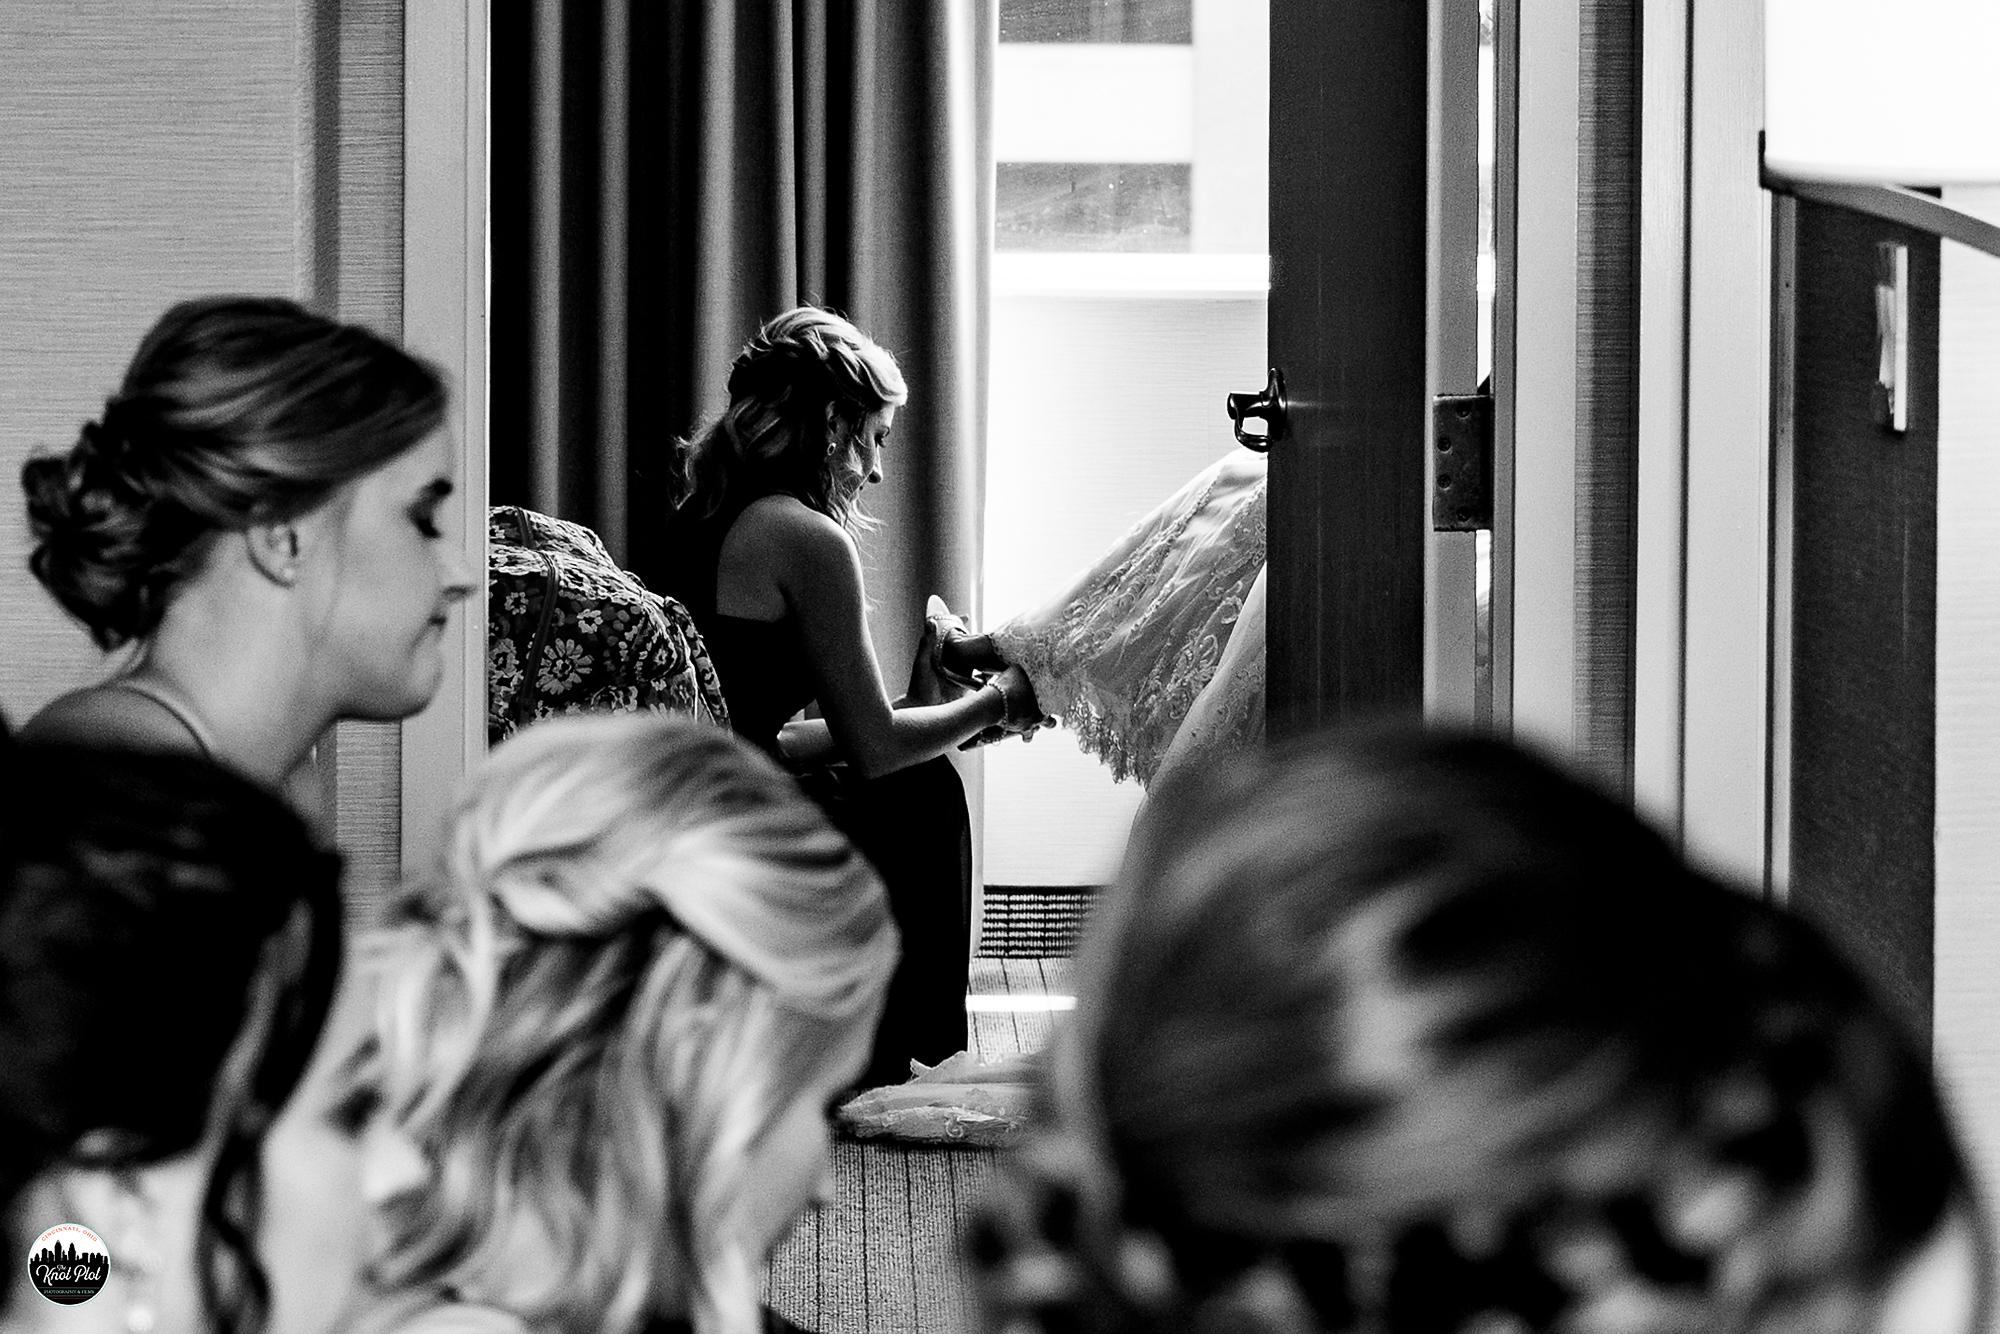 Hyde-Park-United-Methodist-Church-Cincinnati-Wedding-Photography-10.jpg